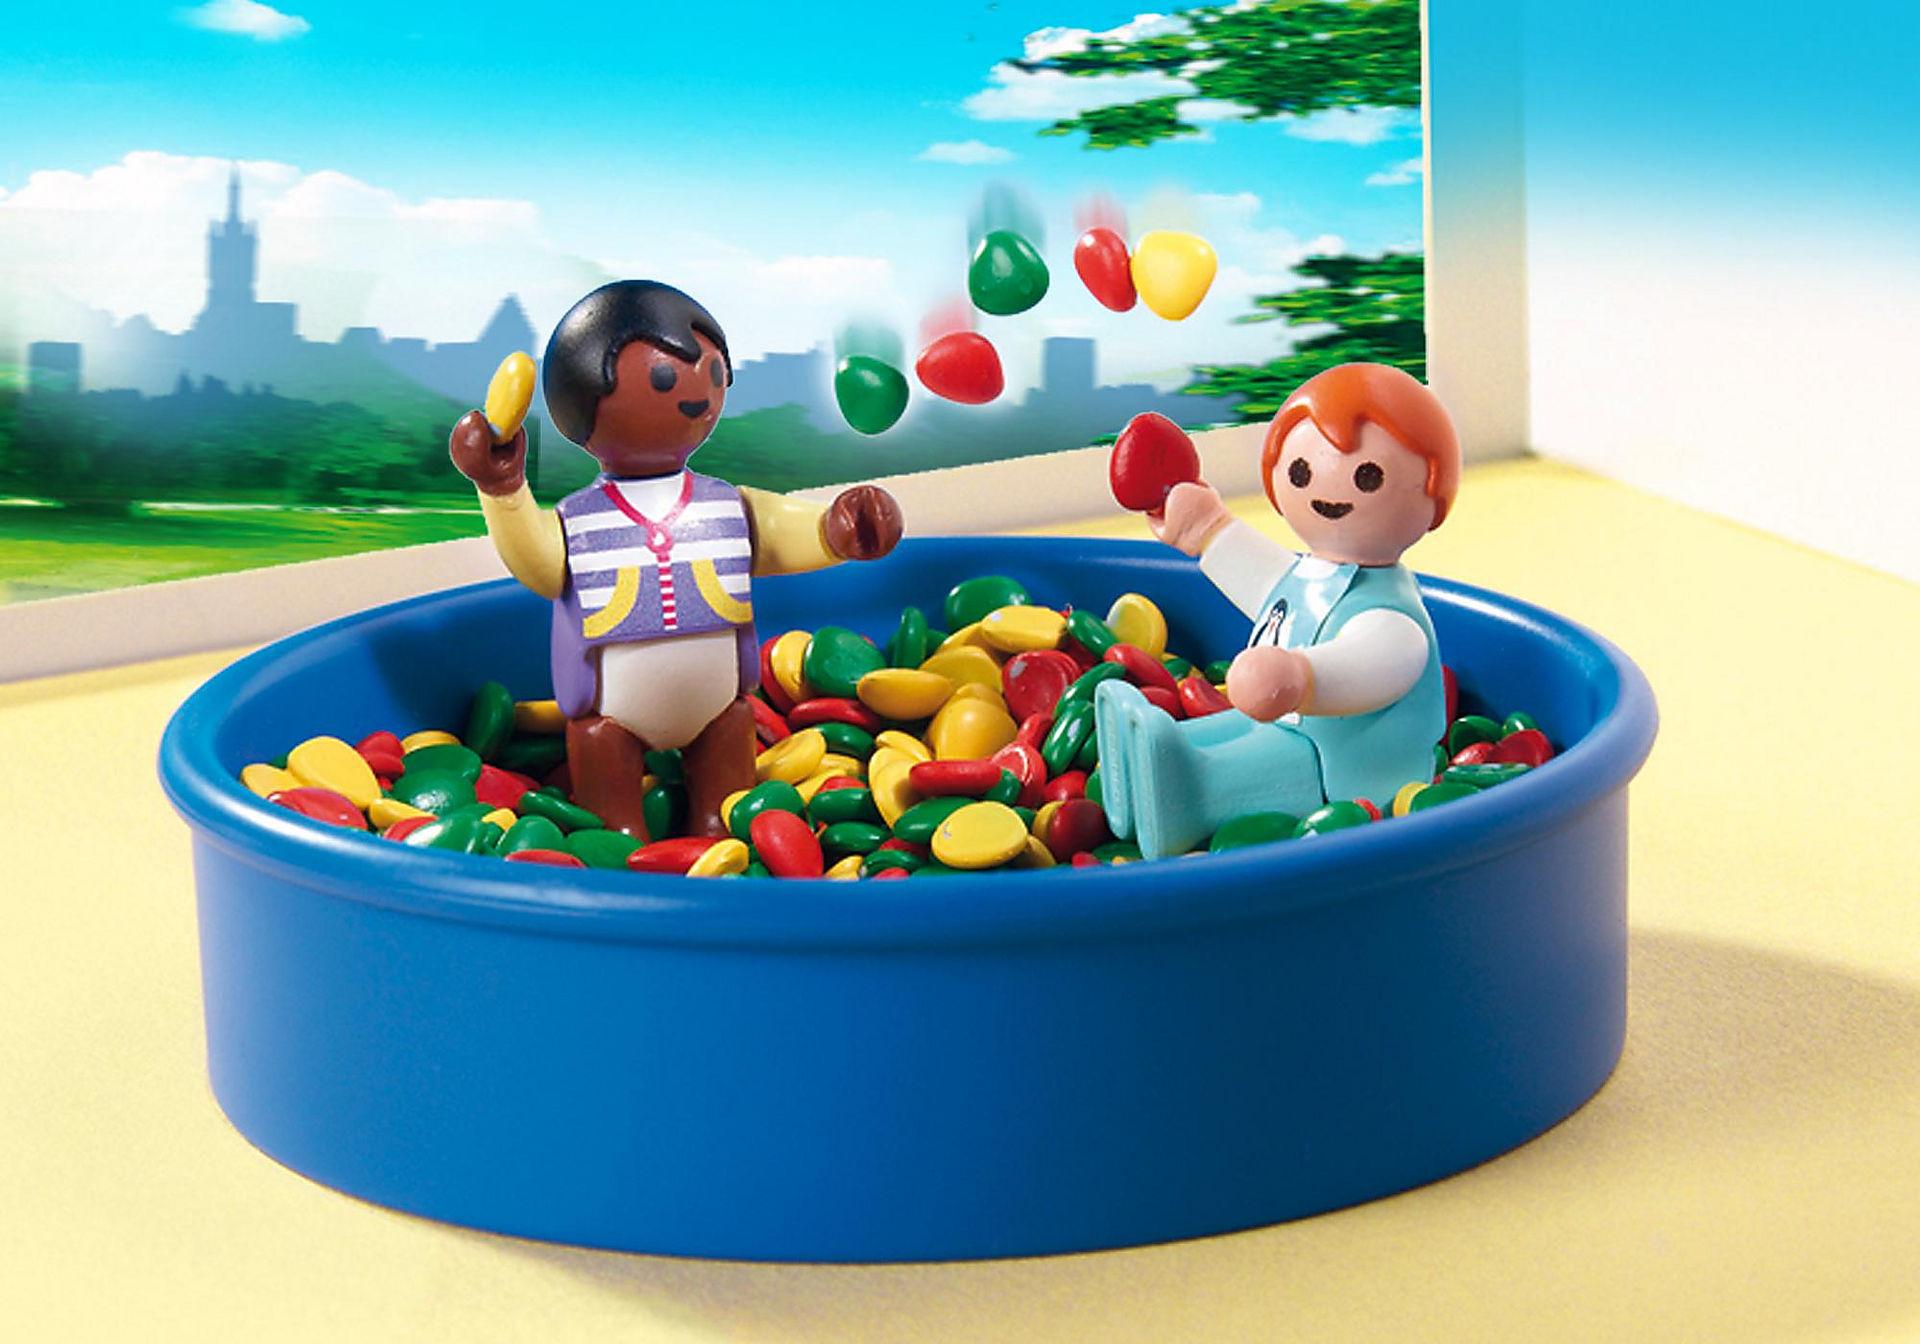 http://media.playmobil.com/i/playmobil/5572_product_extra1/Bällebad